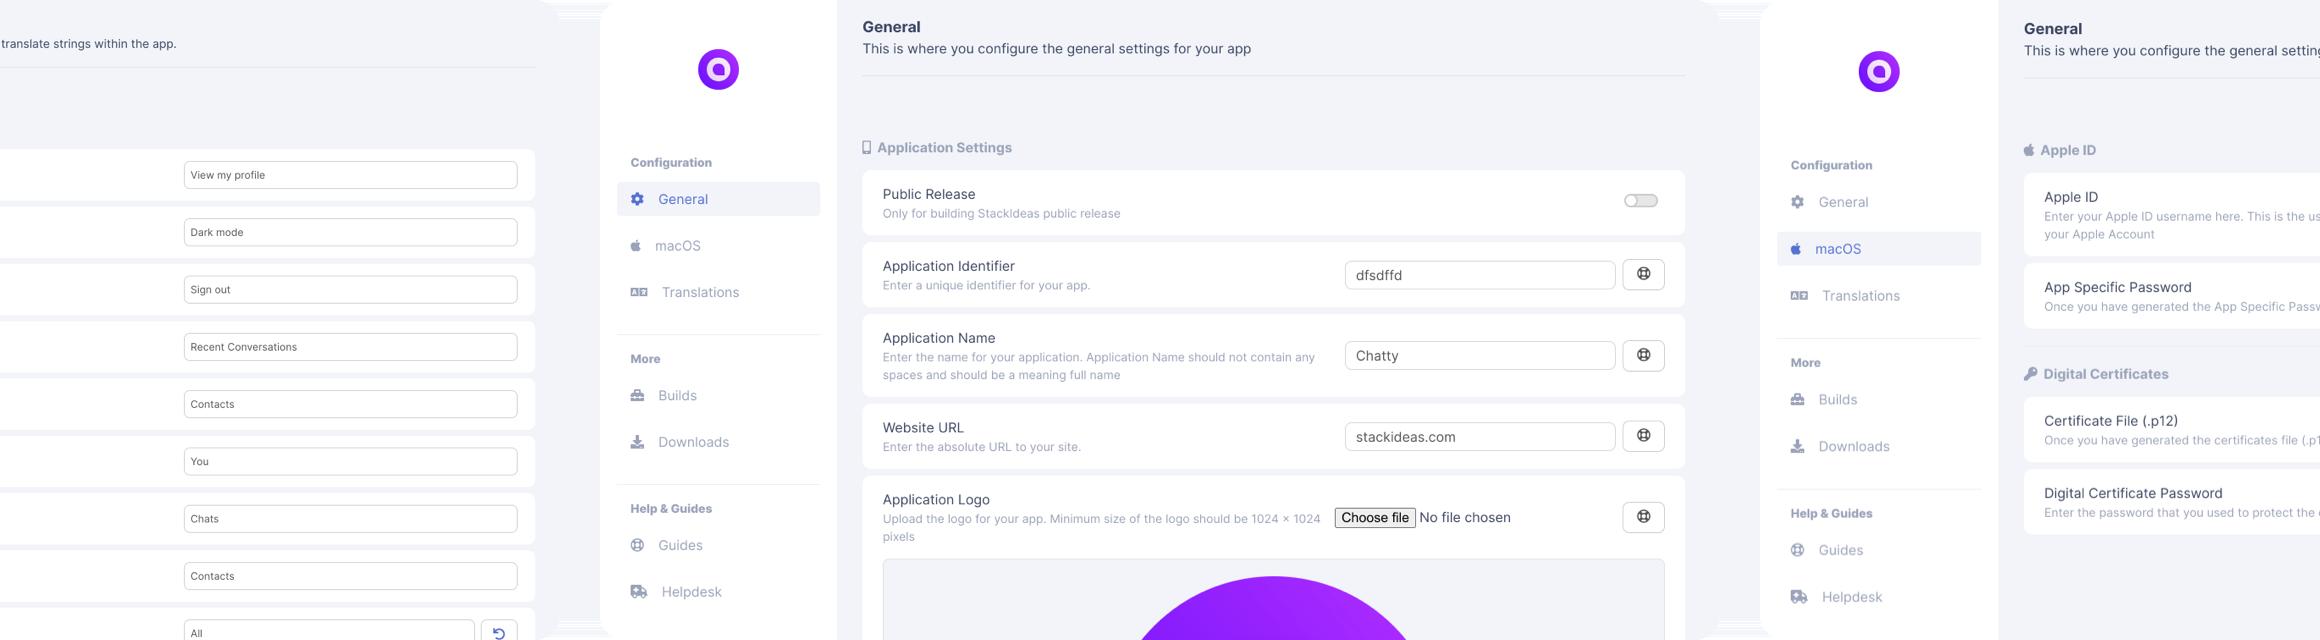 ConverseKit Desktop App Odin Build Manager